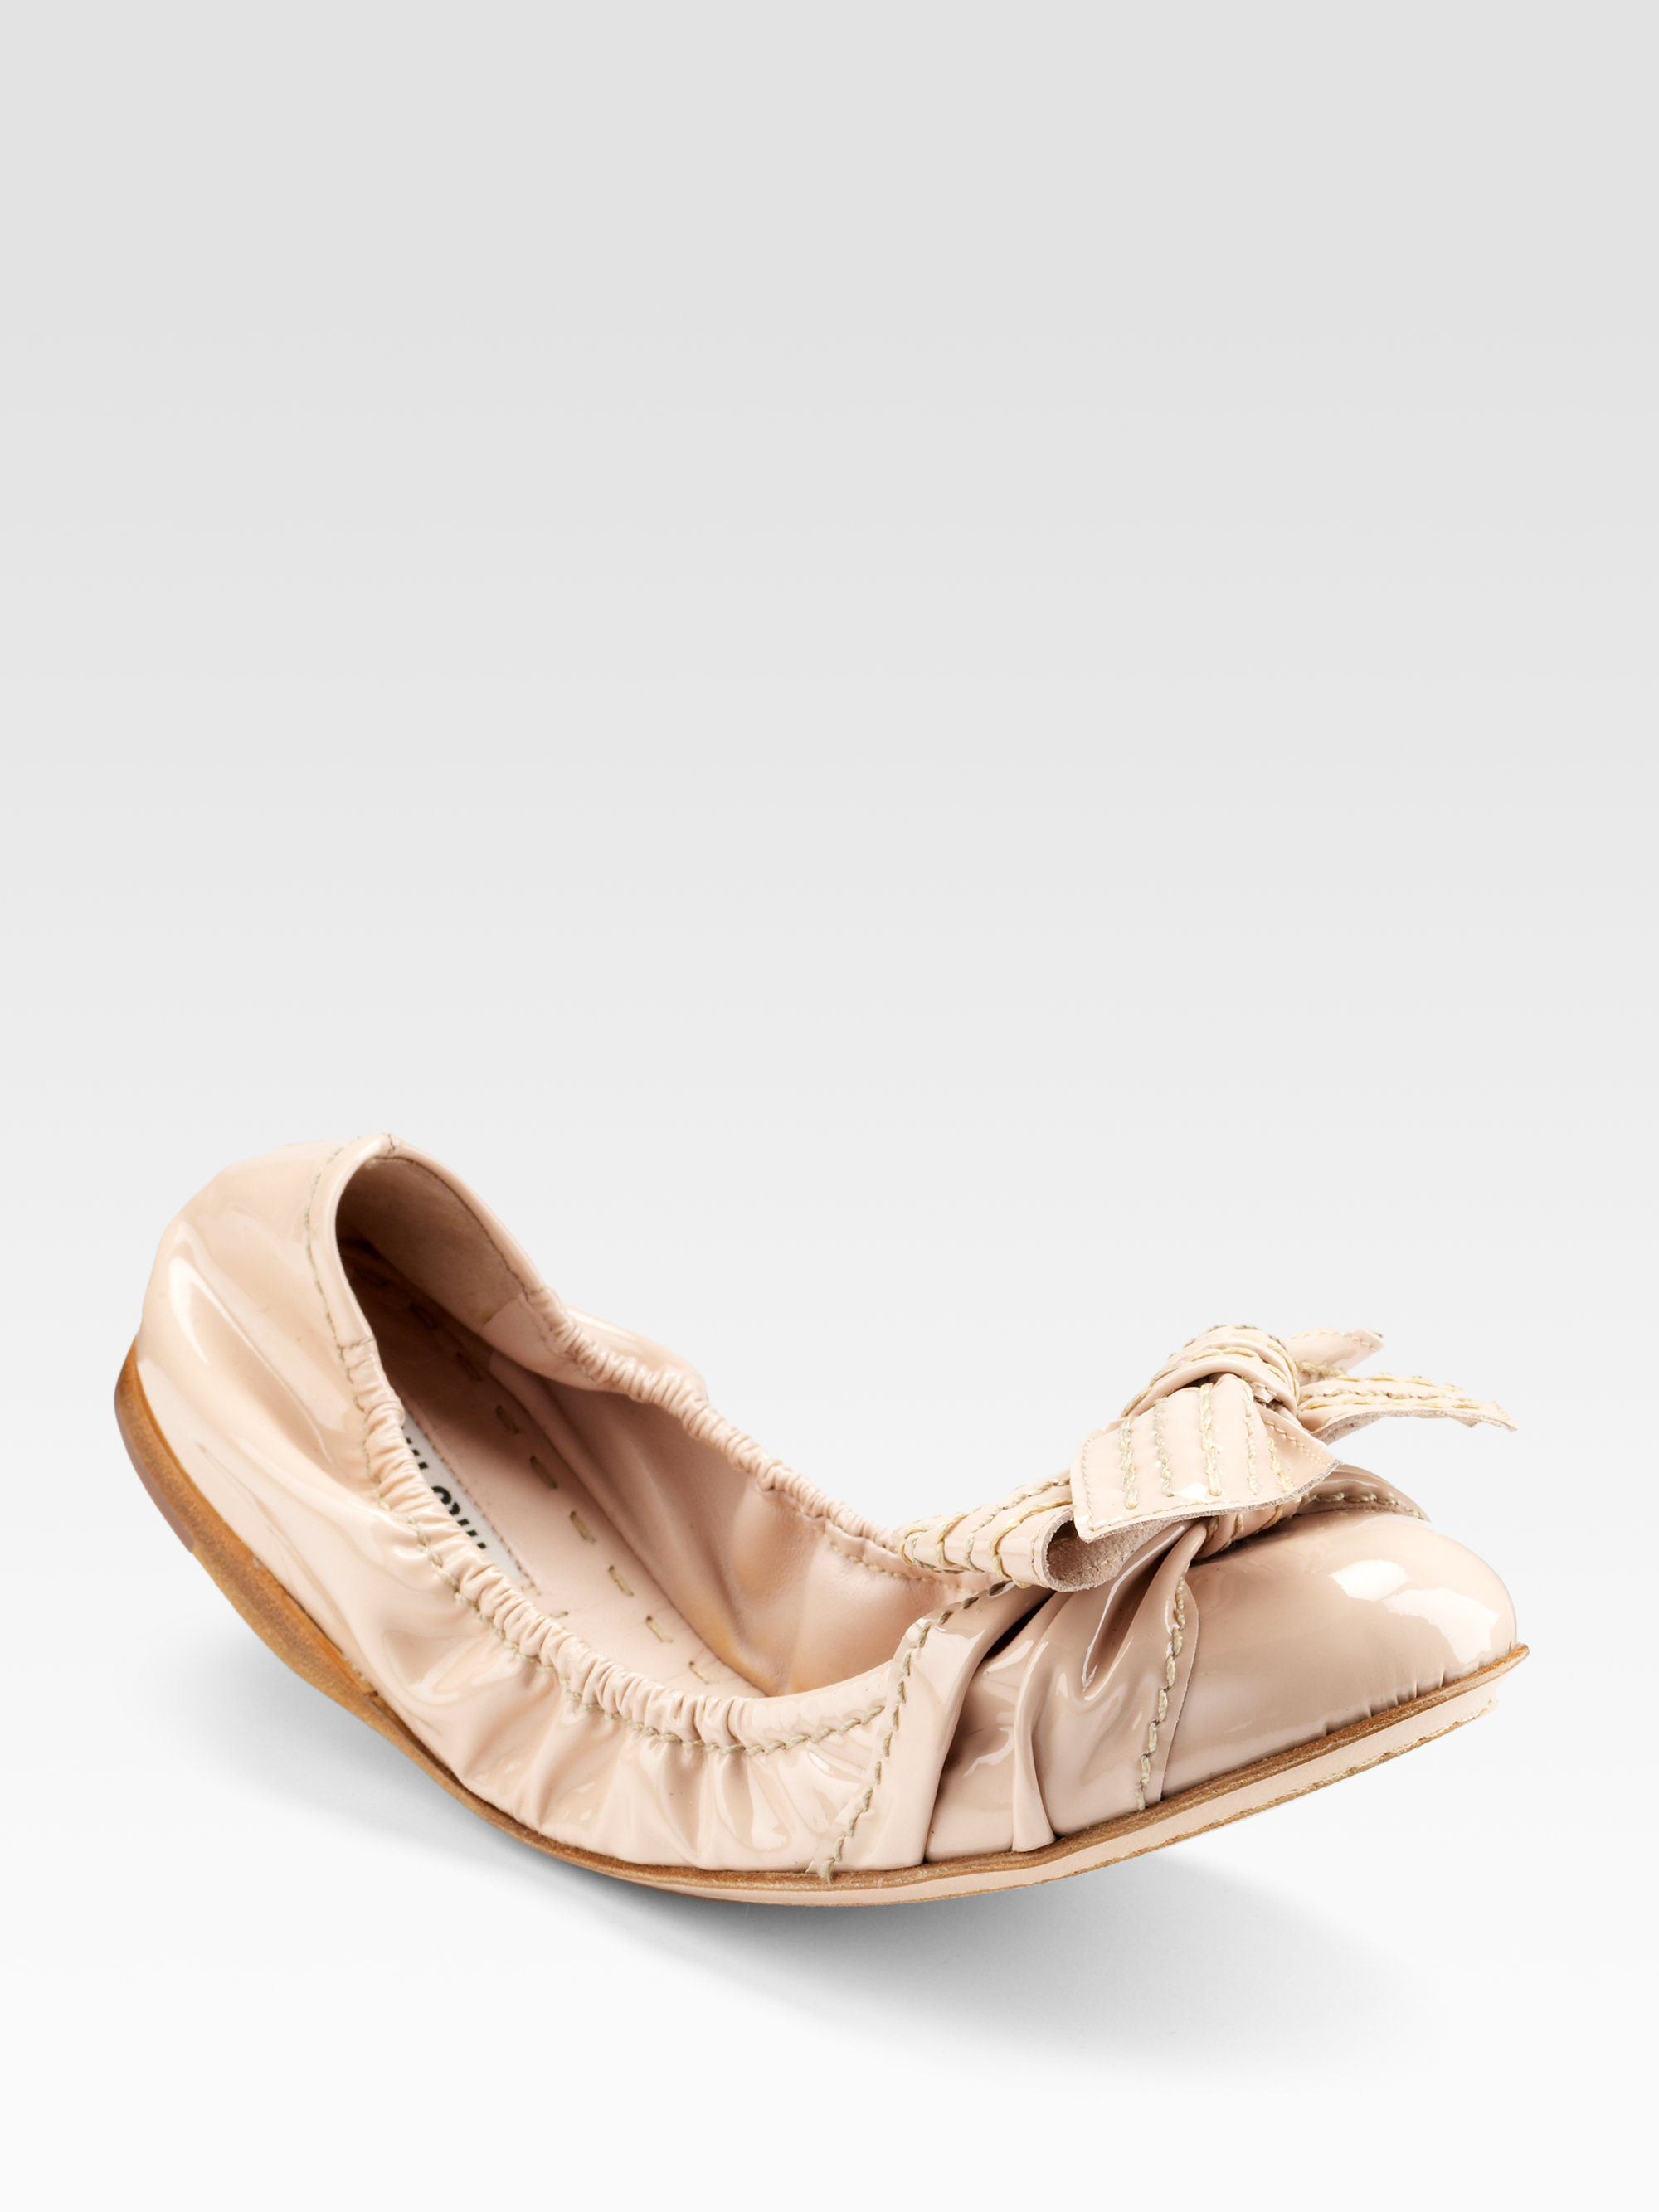 ef3b94ccb5b Lyst - Miu Miu Scrunch Patent Leather Ballet Flats in Natural